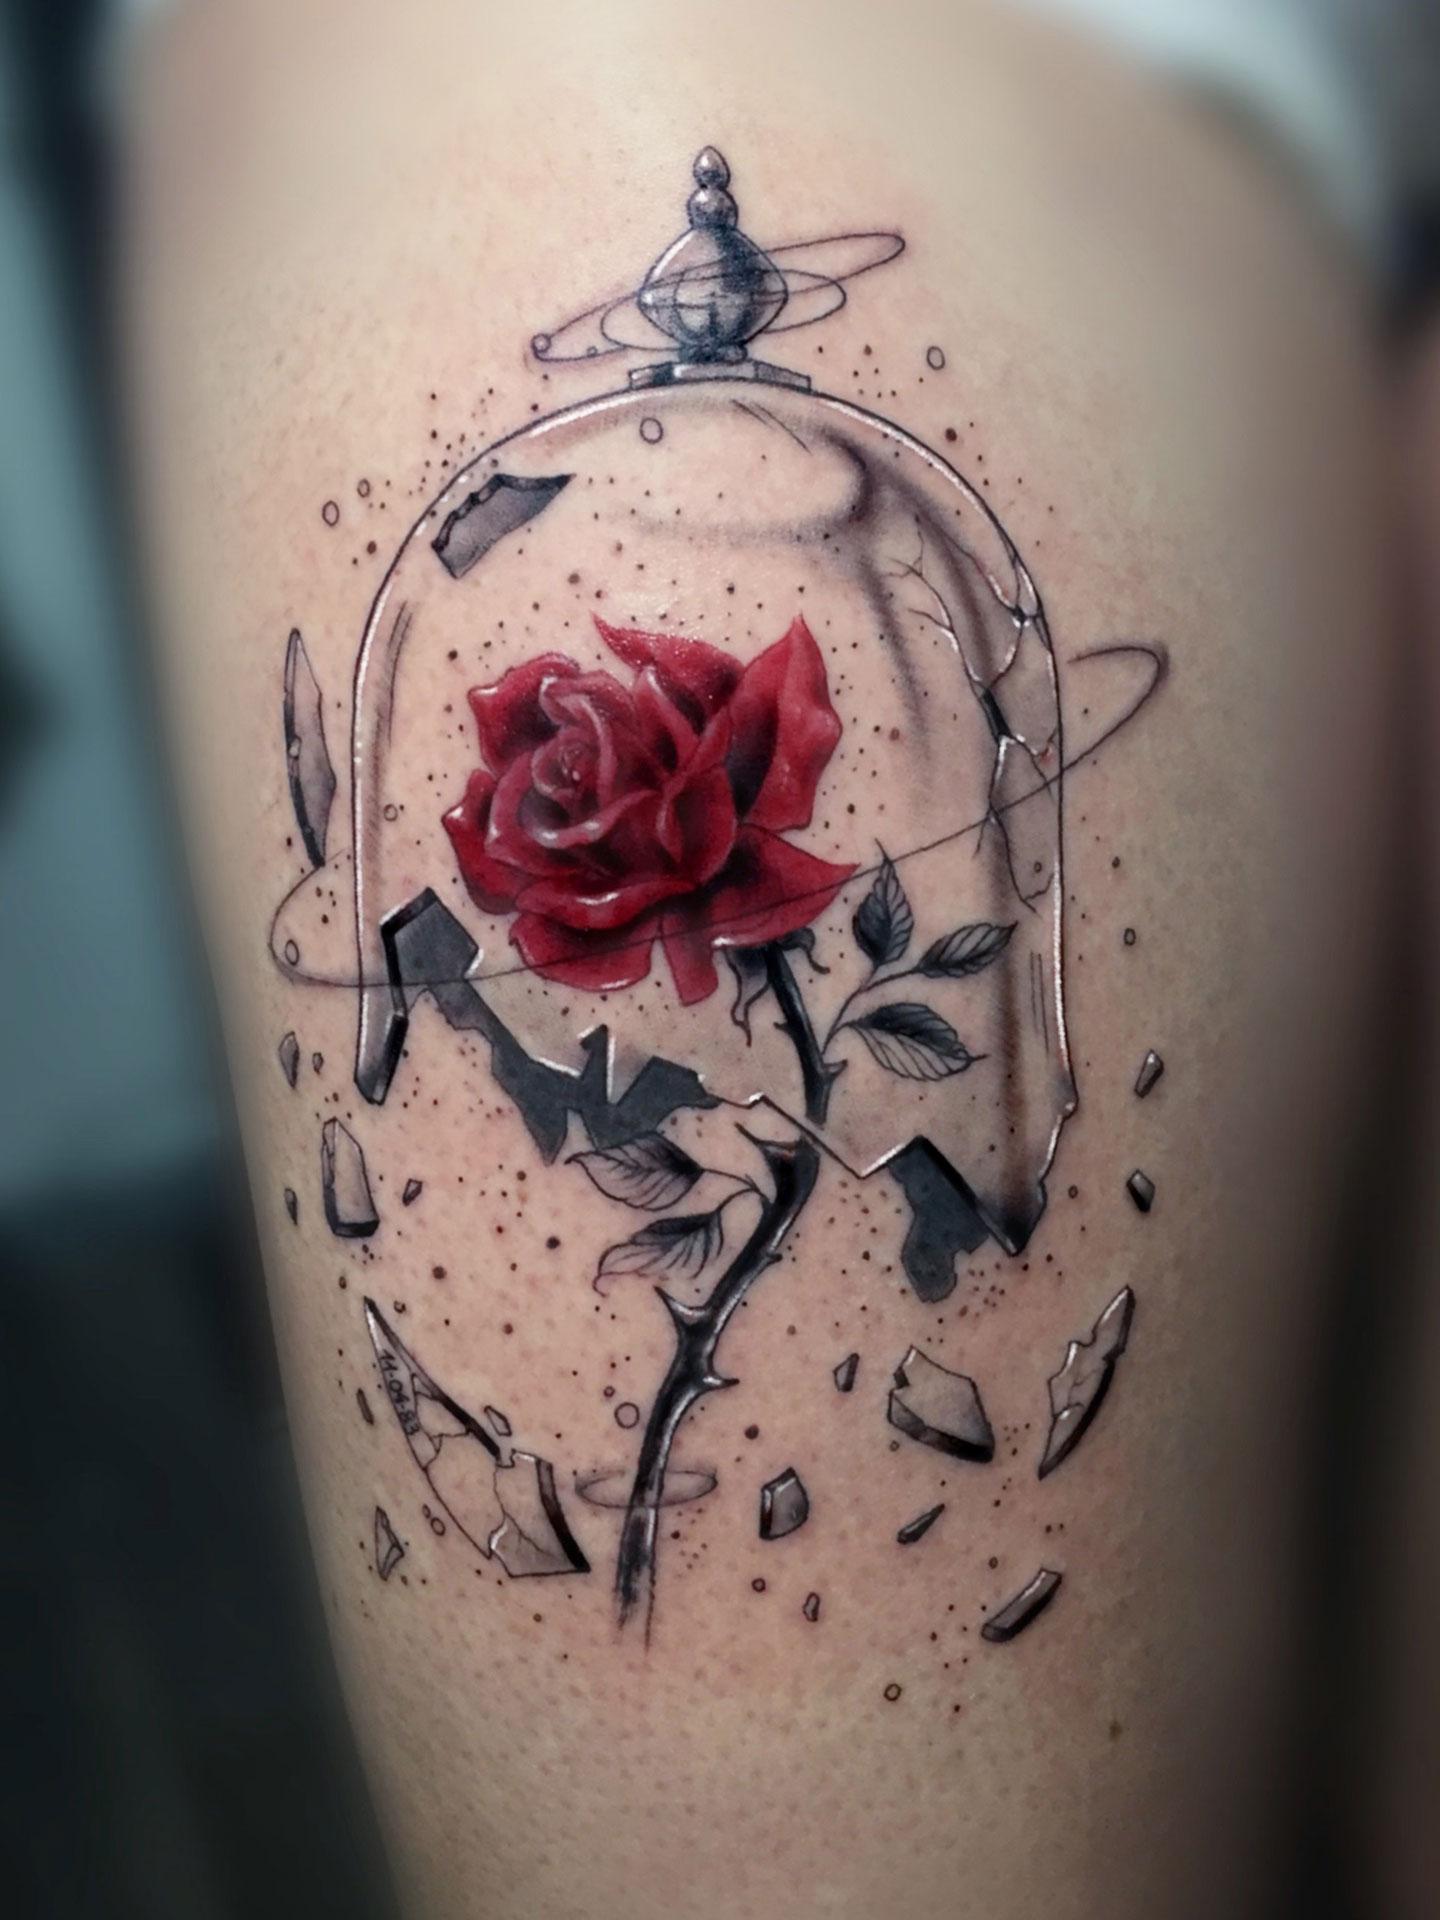 Tatuaje Rosa Cristal